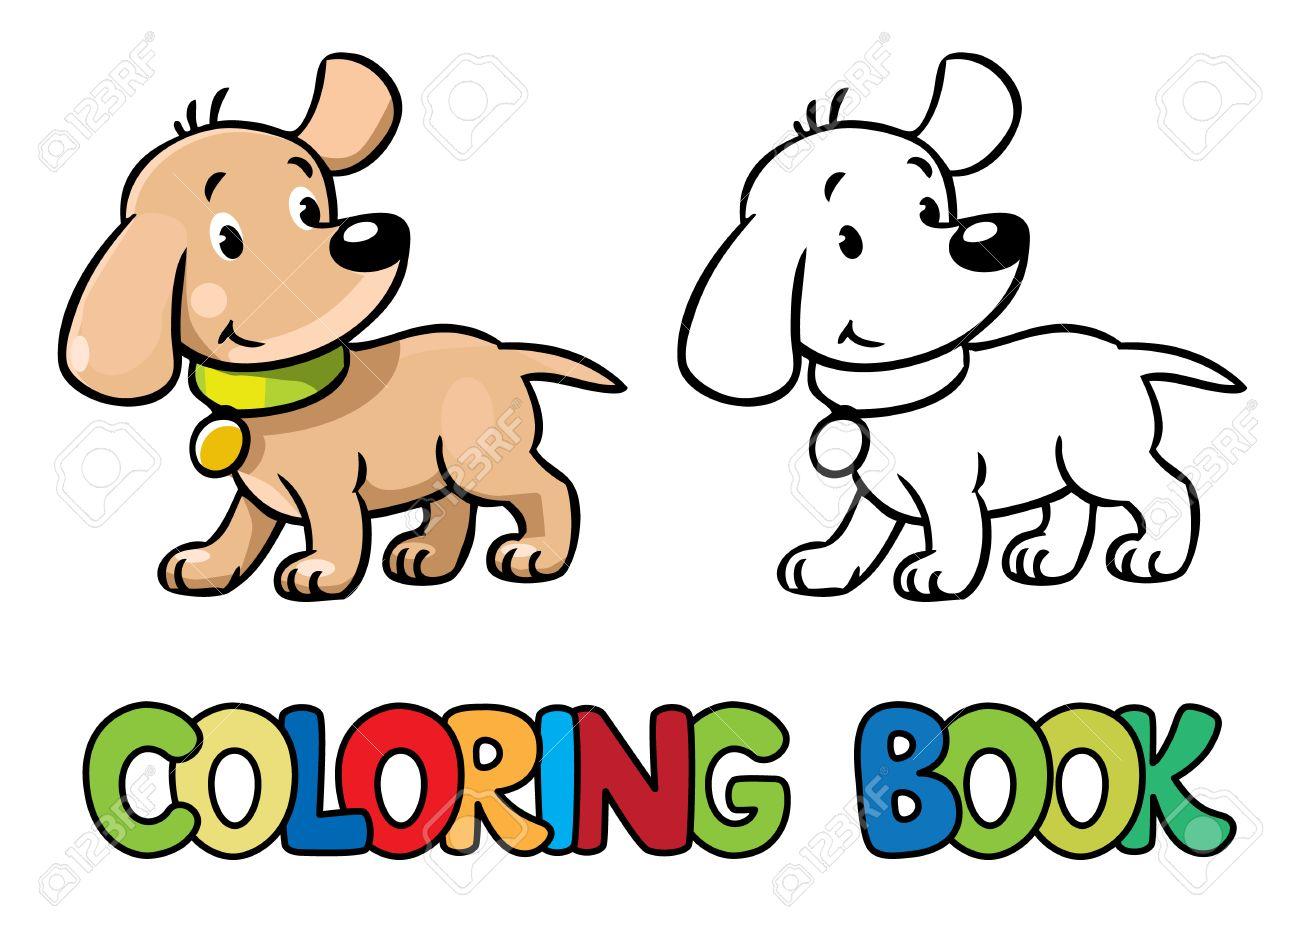 Libro Para Colorear O Dibujo Para Colorear De Pequeño Perro O ...